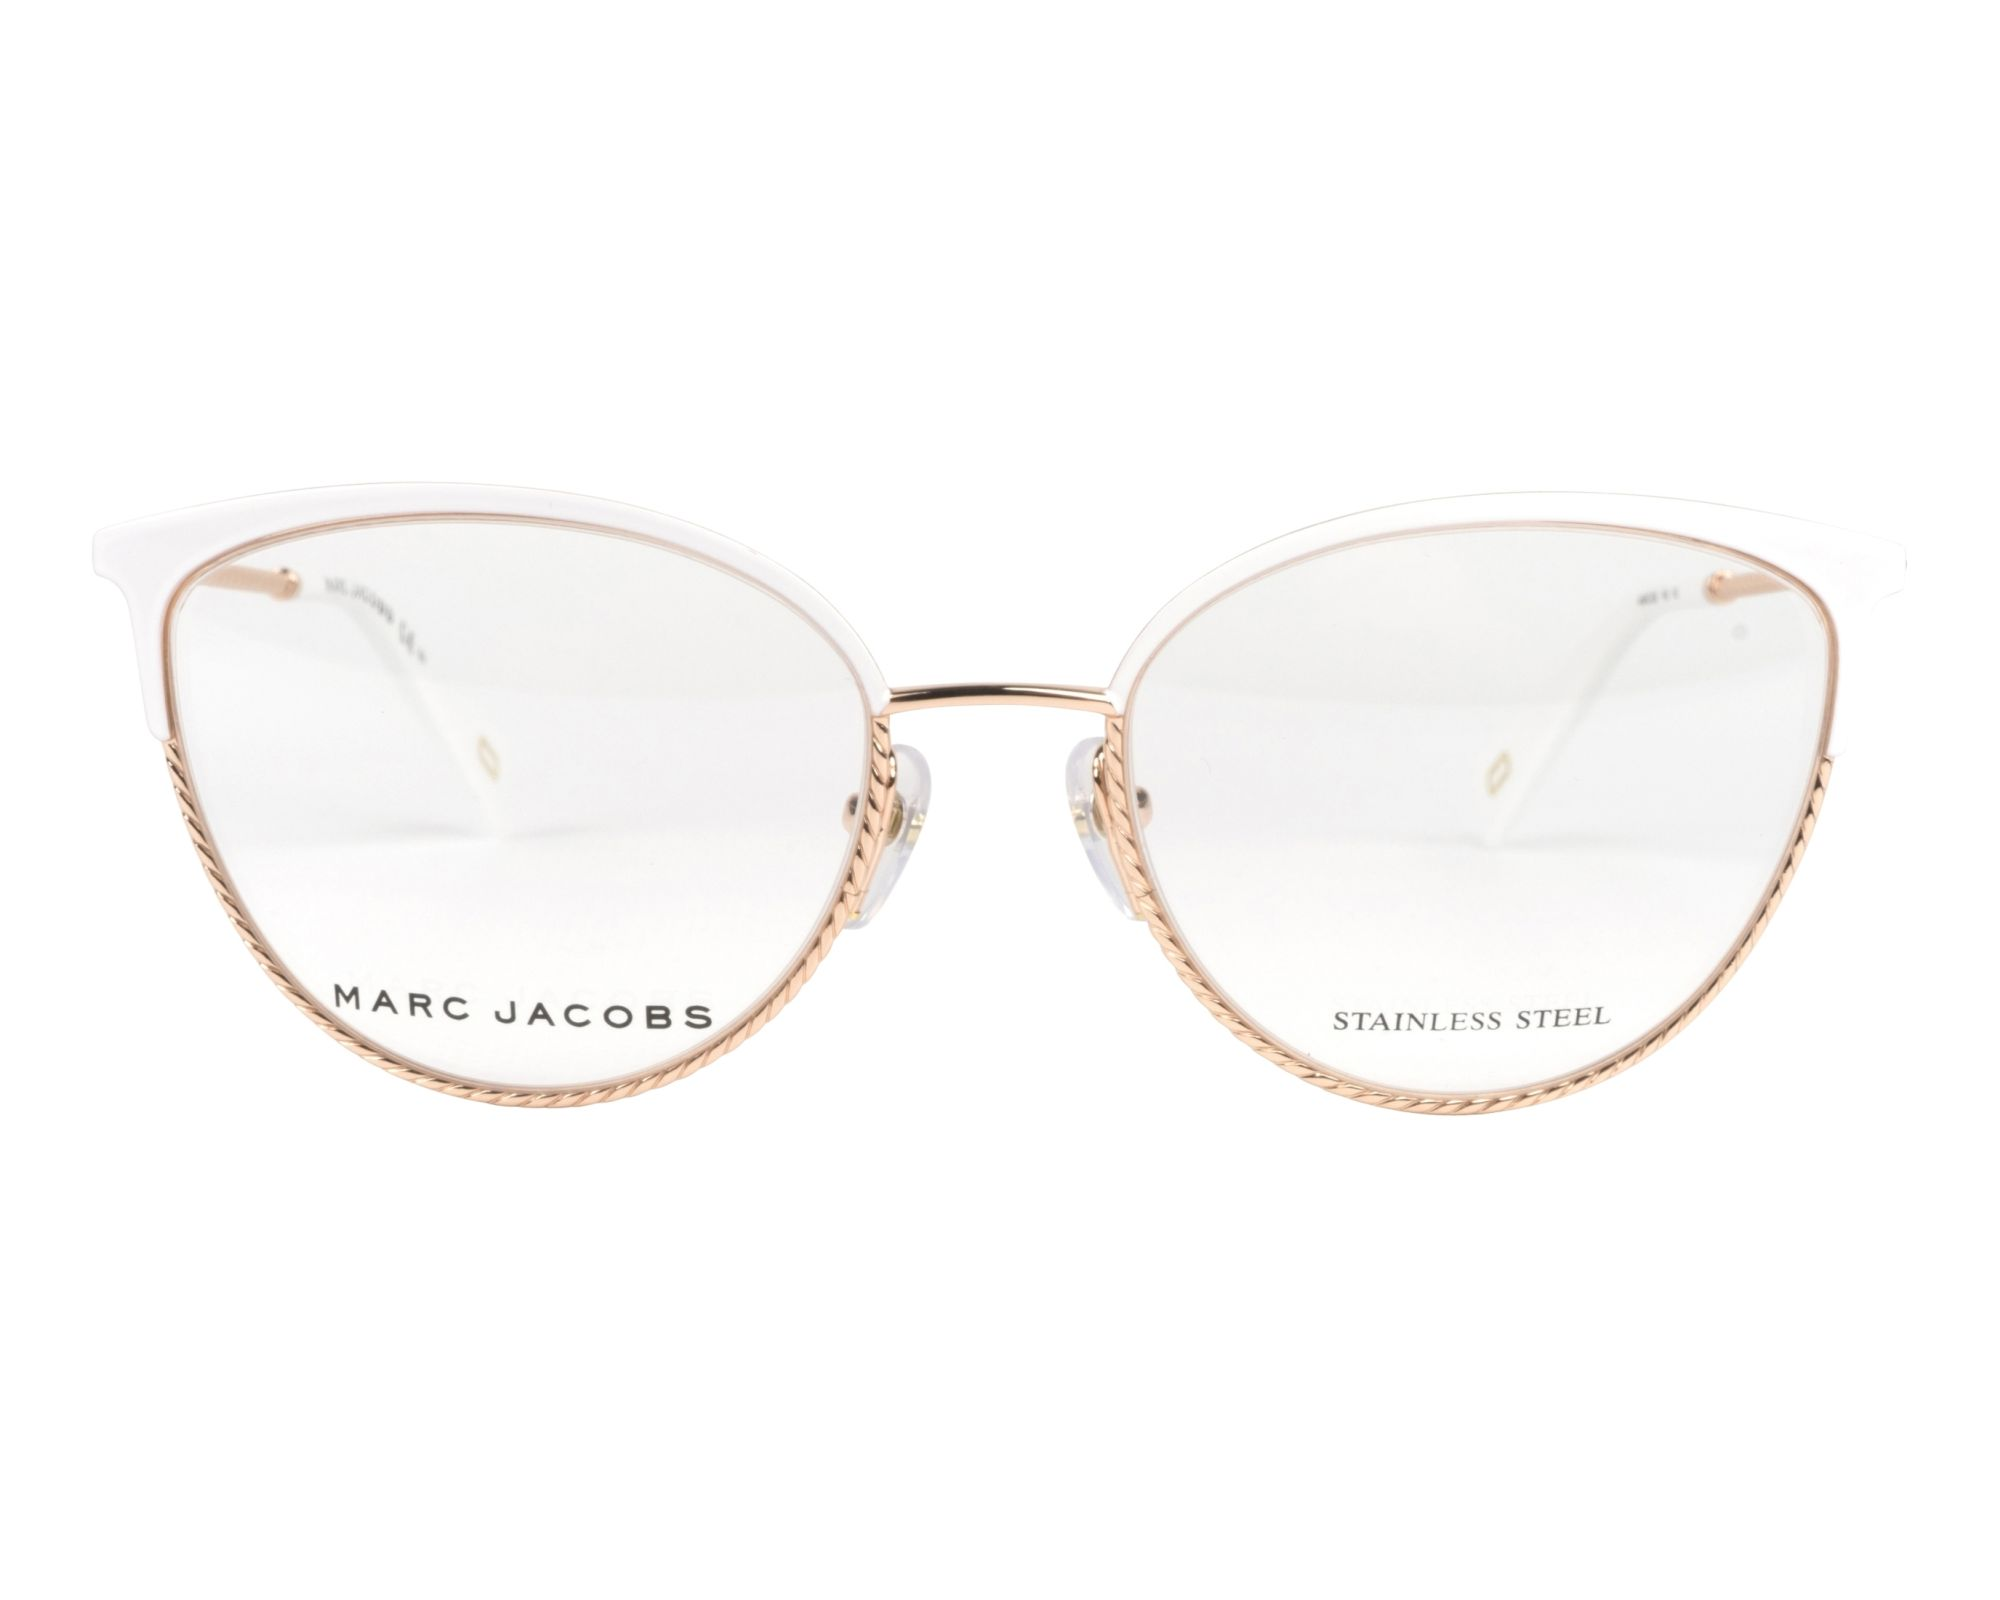 7cf6293bc8679 Gafas Graduadas Marc Jacobs MARC-256 VK6 53-18 Blanco Oro cobre vista de